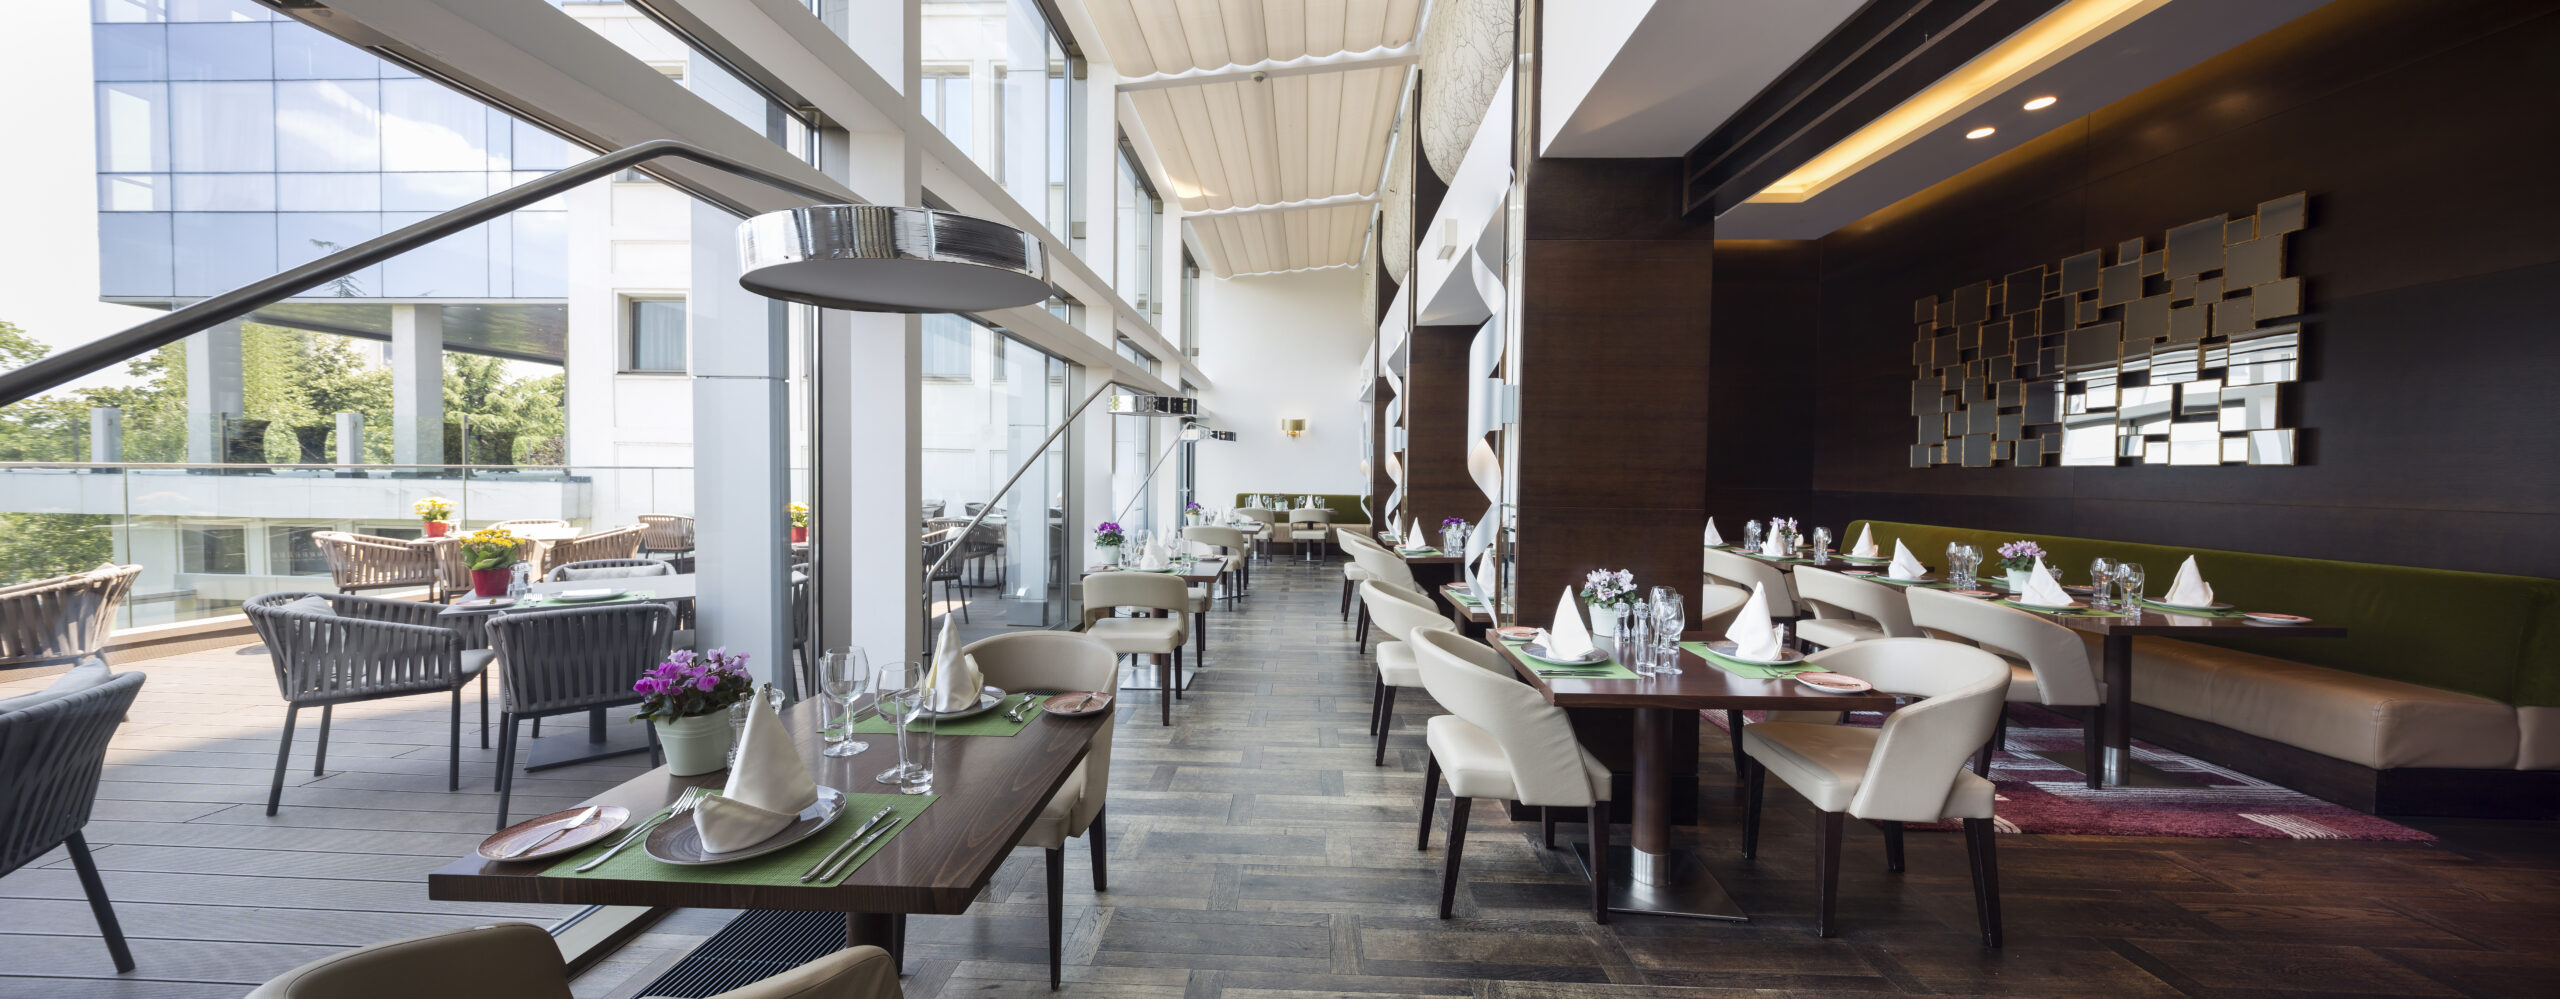 Leisure, Hospitality & Retail